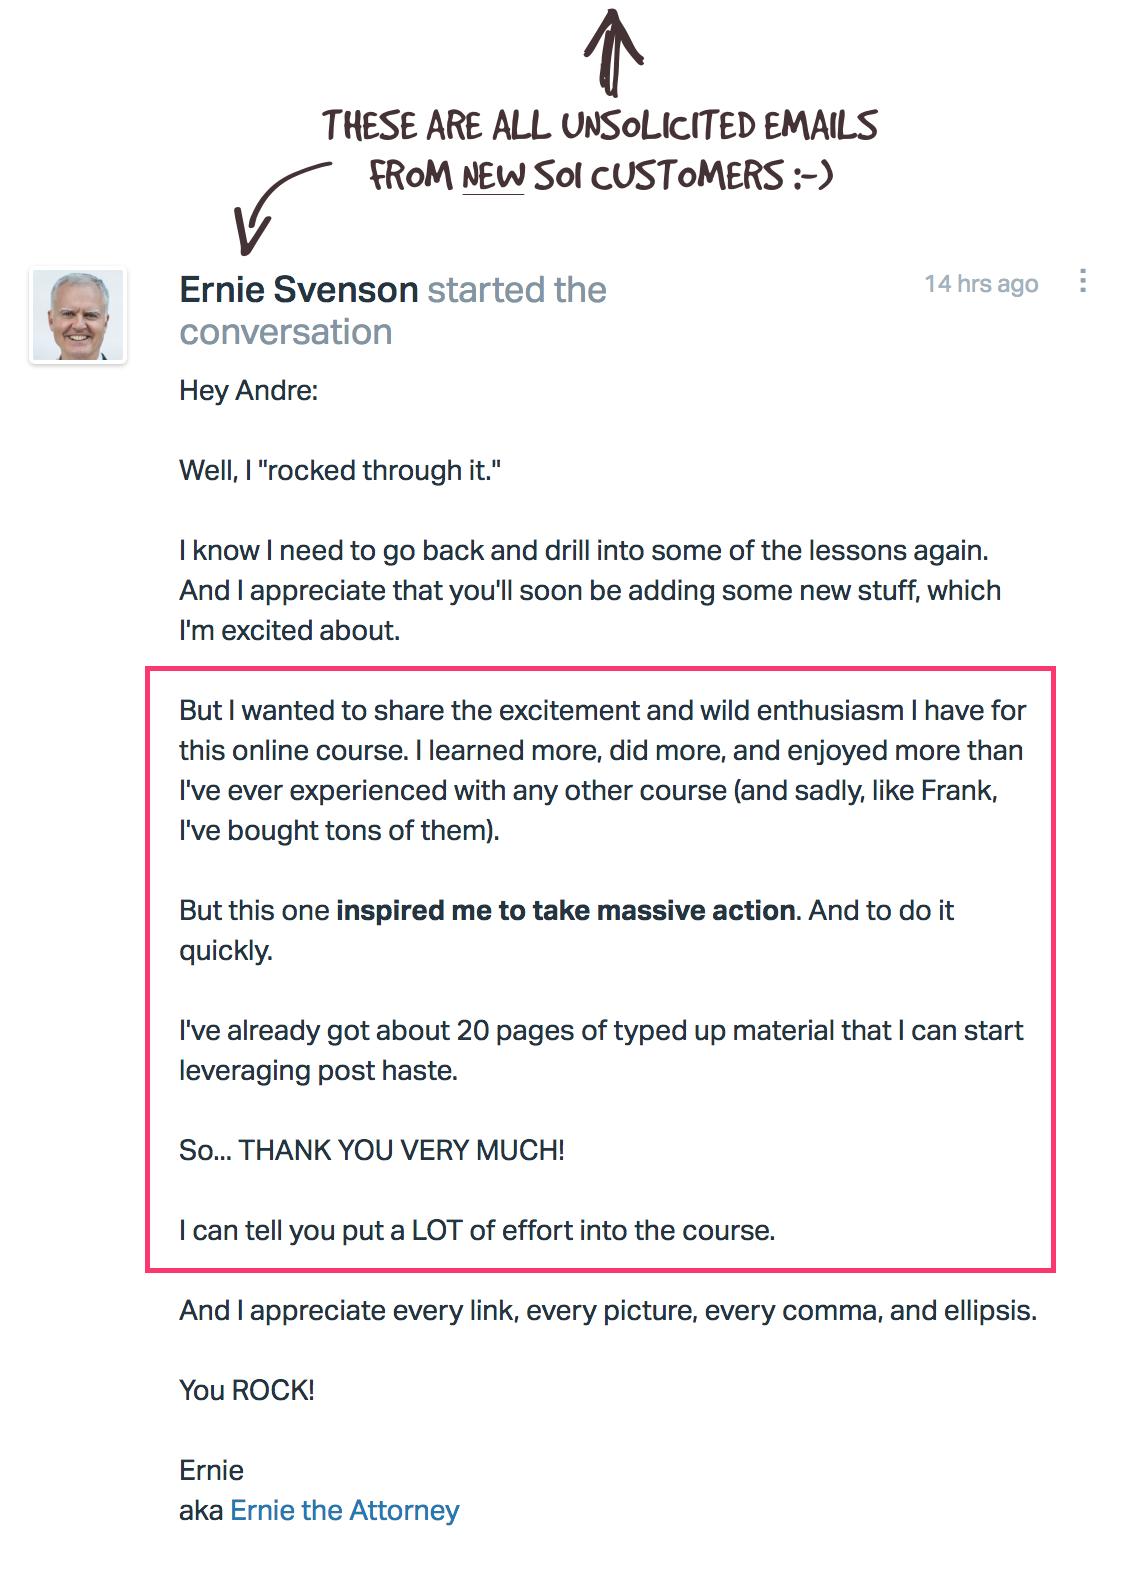 Kudos from Ernie Svenson